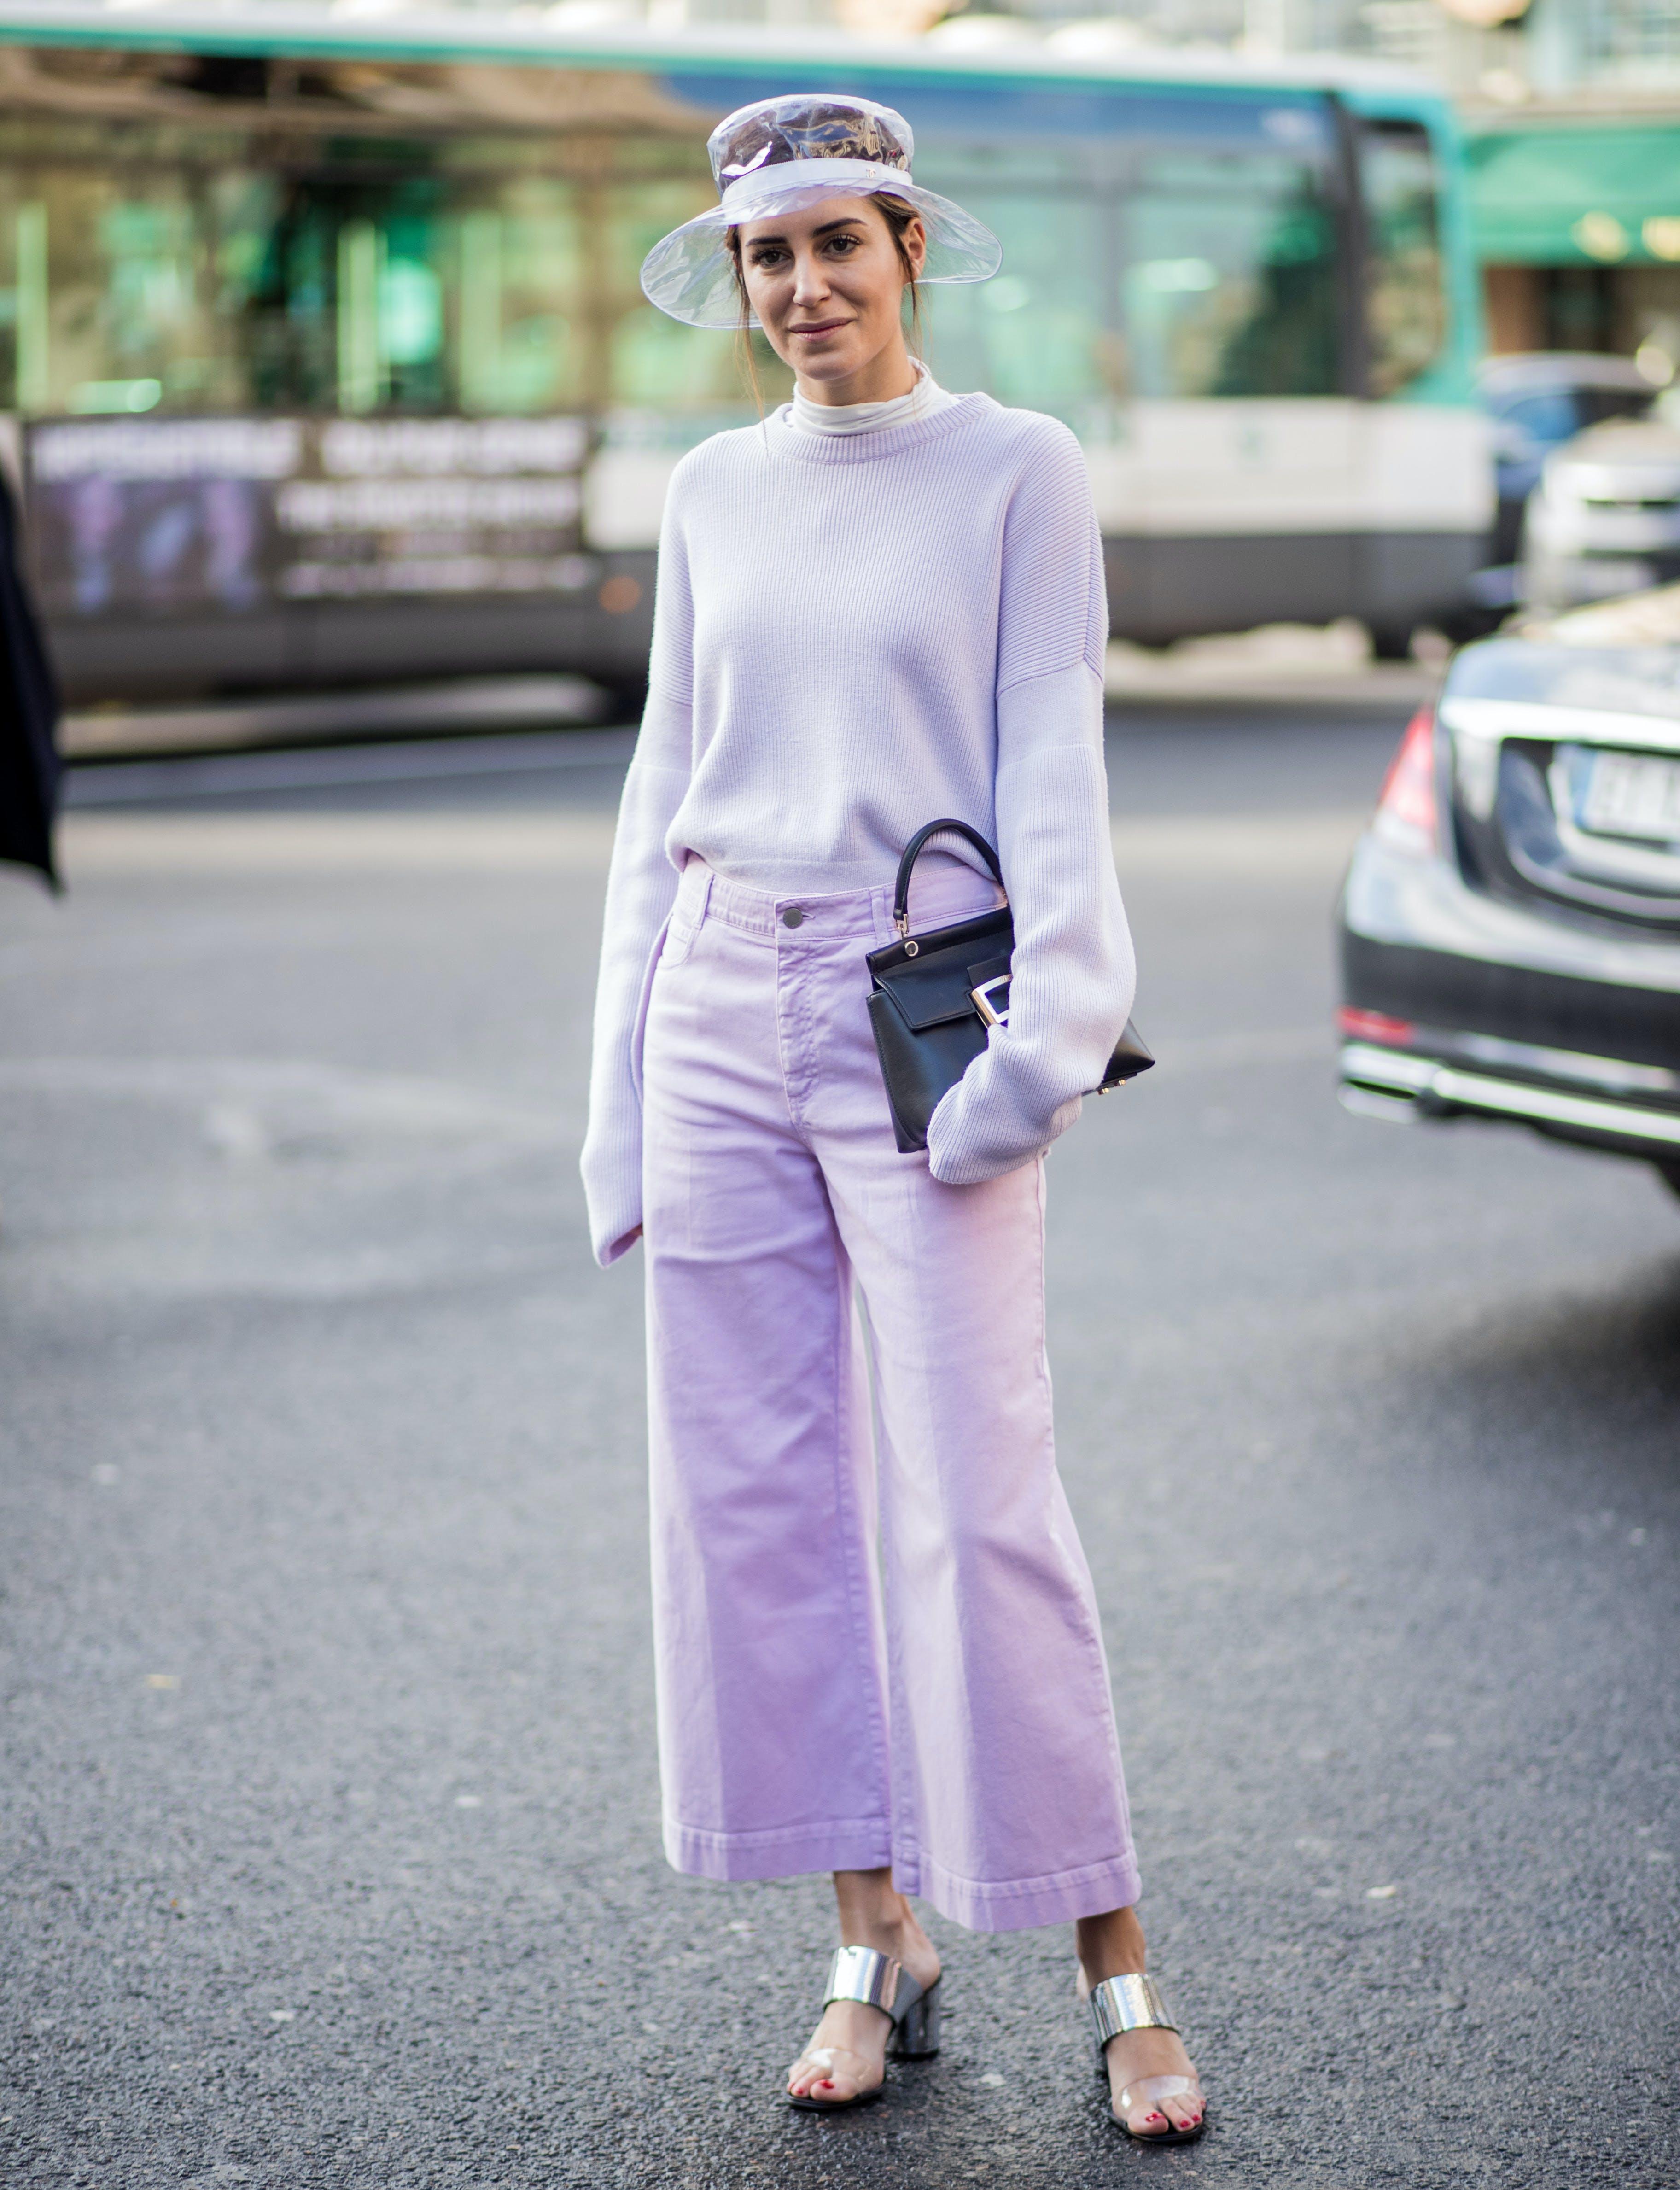 shades of pastel lavender